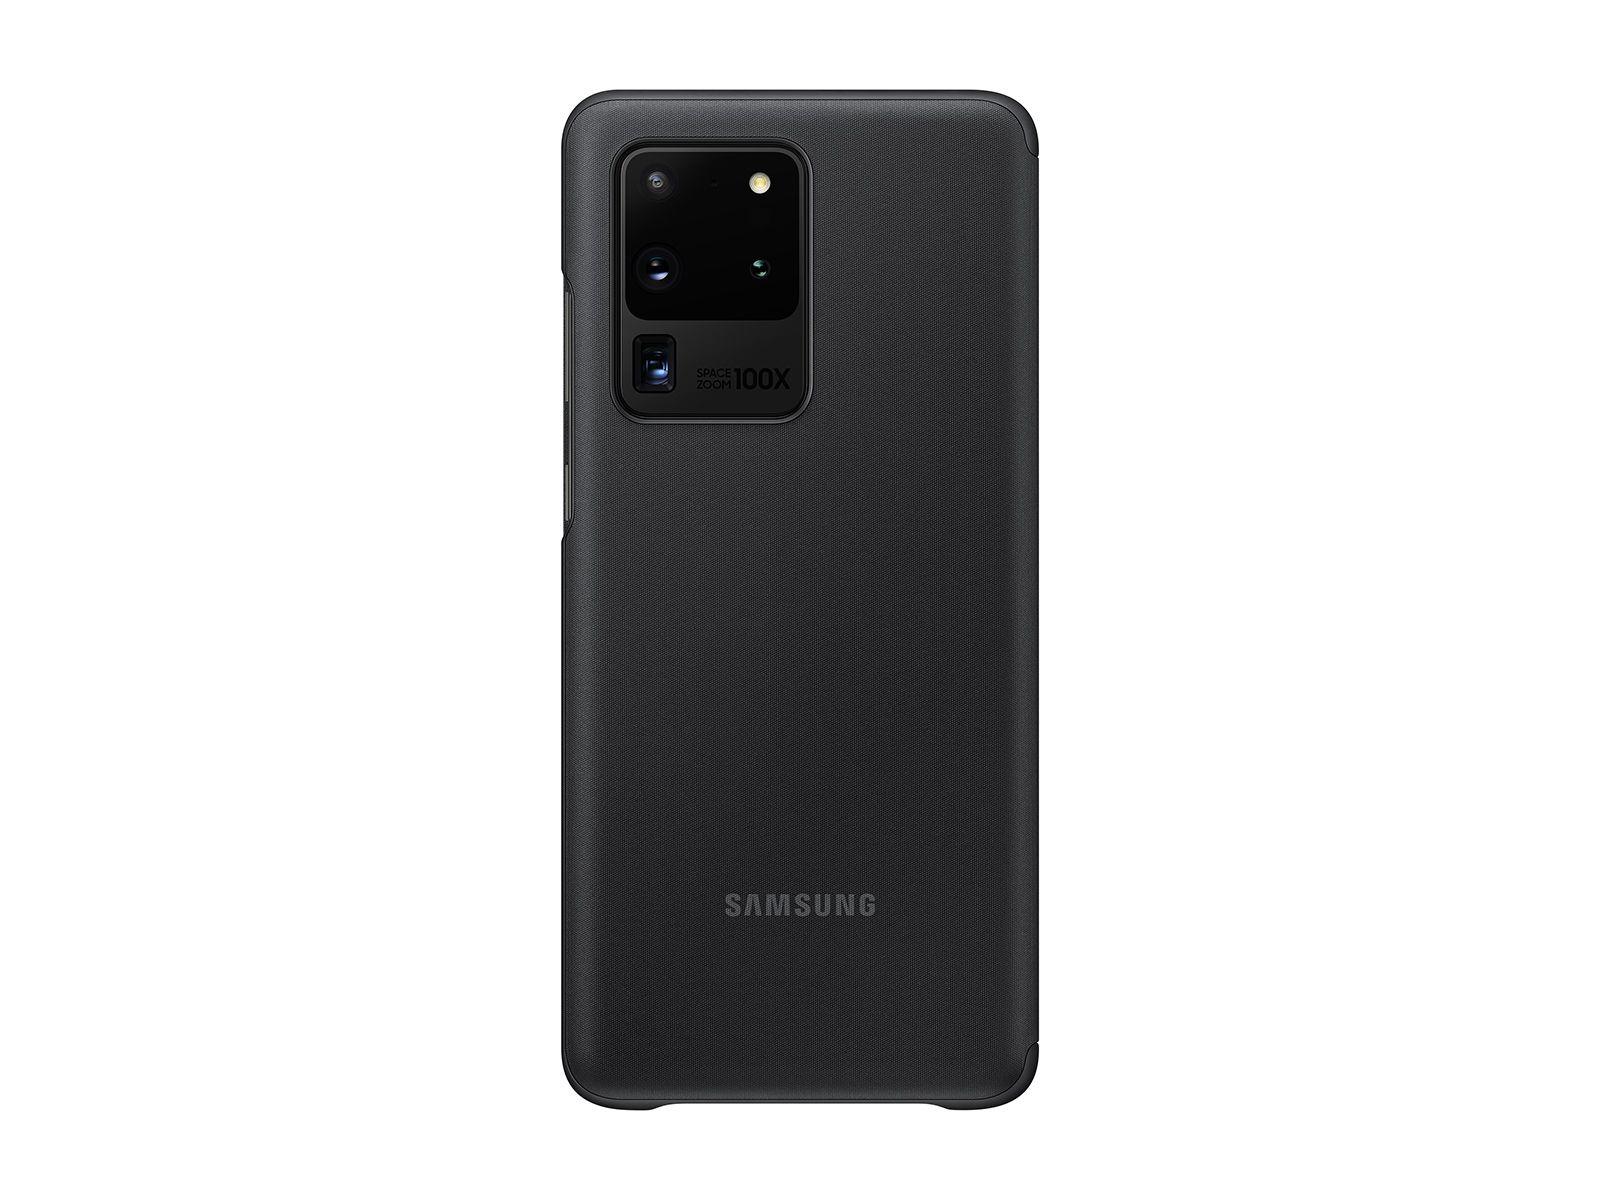 Galaxy S20 Ultra 5G S-View Flip cover Black Mobile Accessories - EF-ZG988CBEGUS | Samsung US